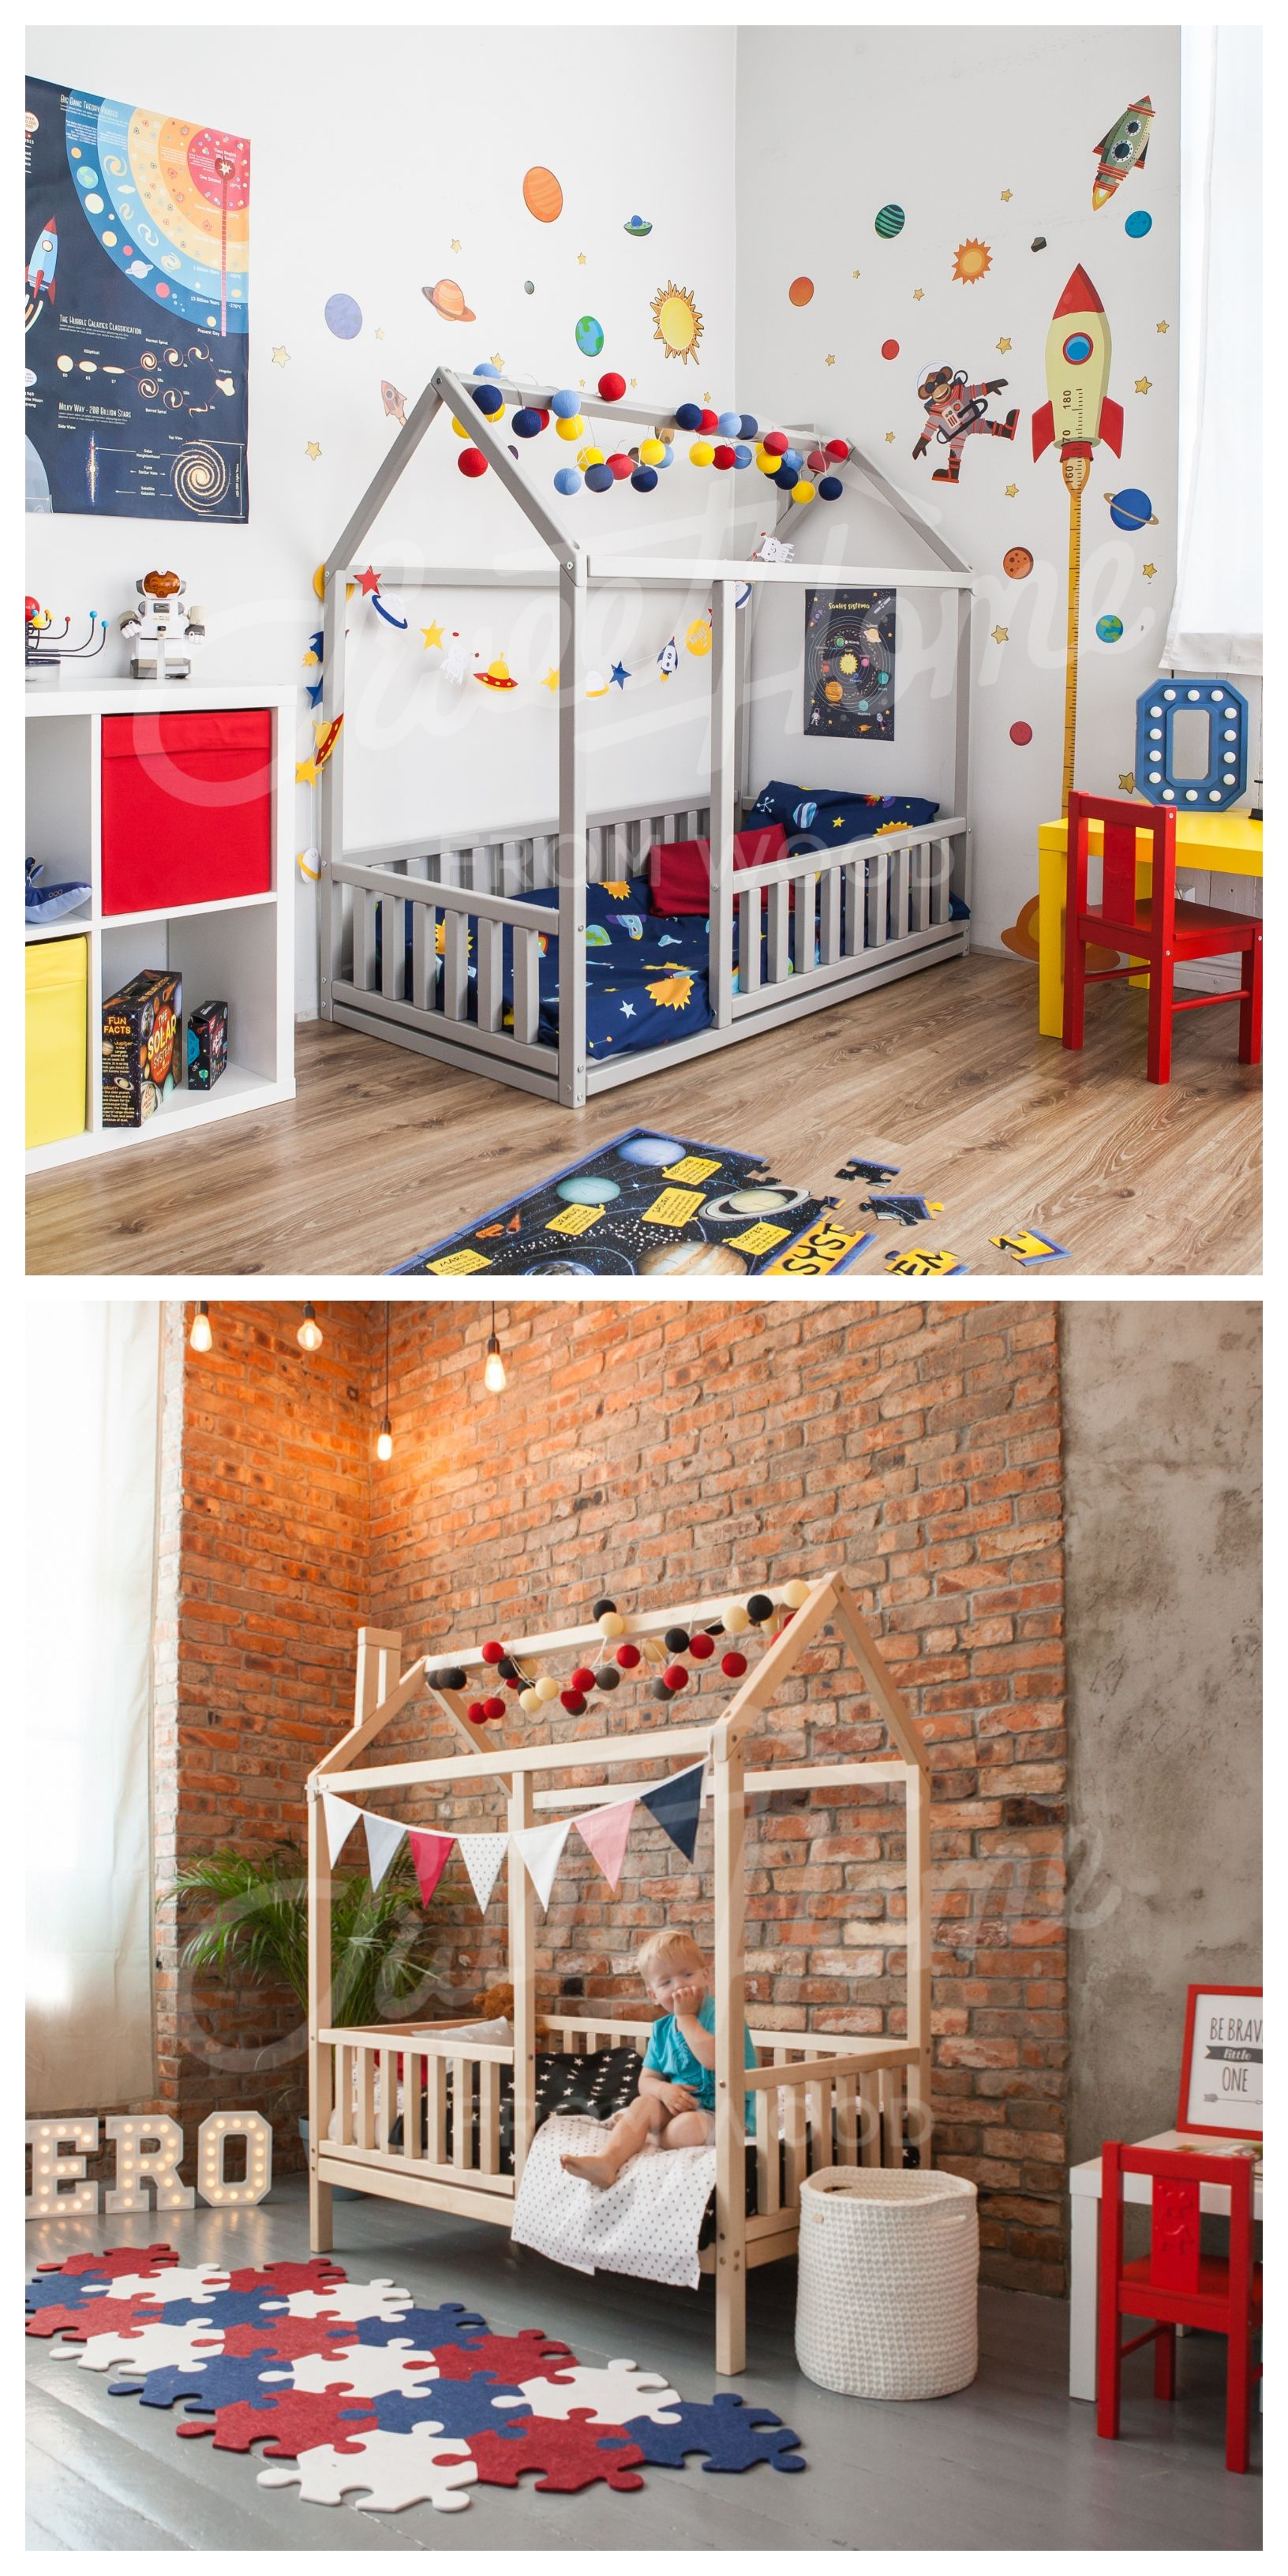 Toddler Bed Child Room Ideas Children Bed Floor Bed